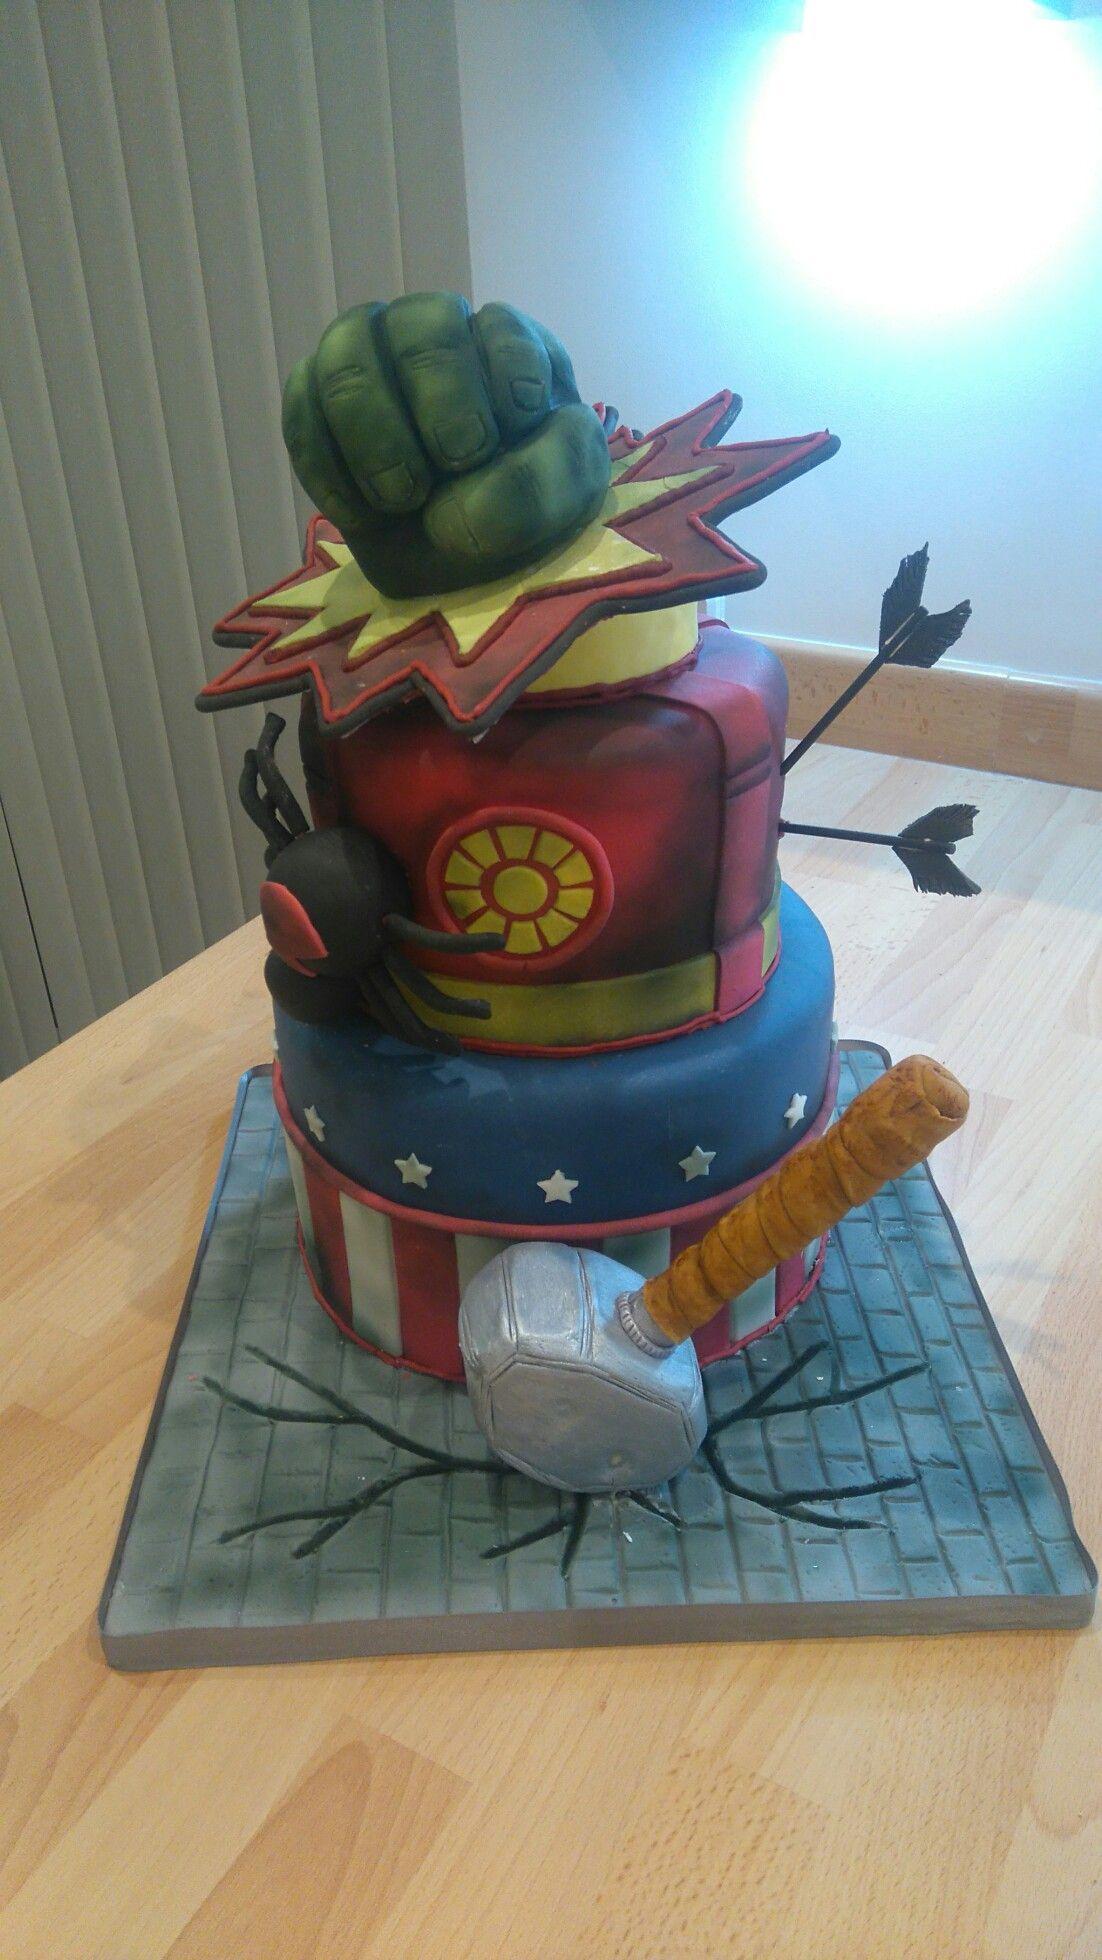 America Thor Marvel Avengers Kinder Geburtstag Party Masken Iron Man Hulk C